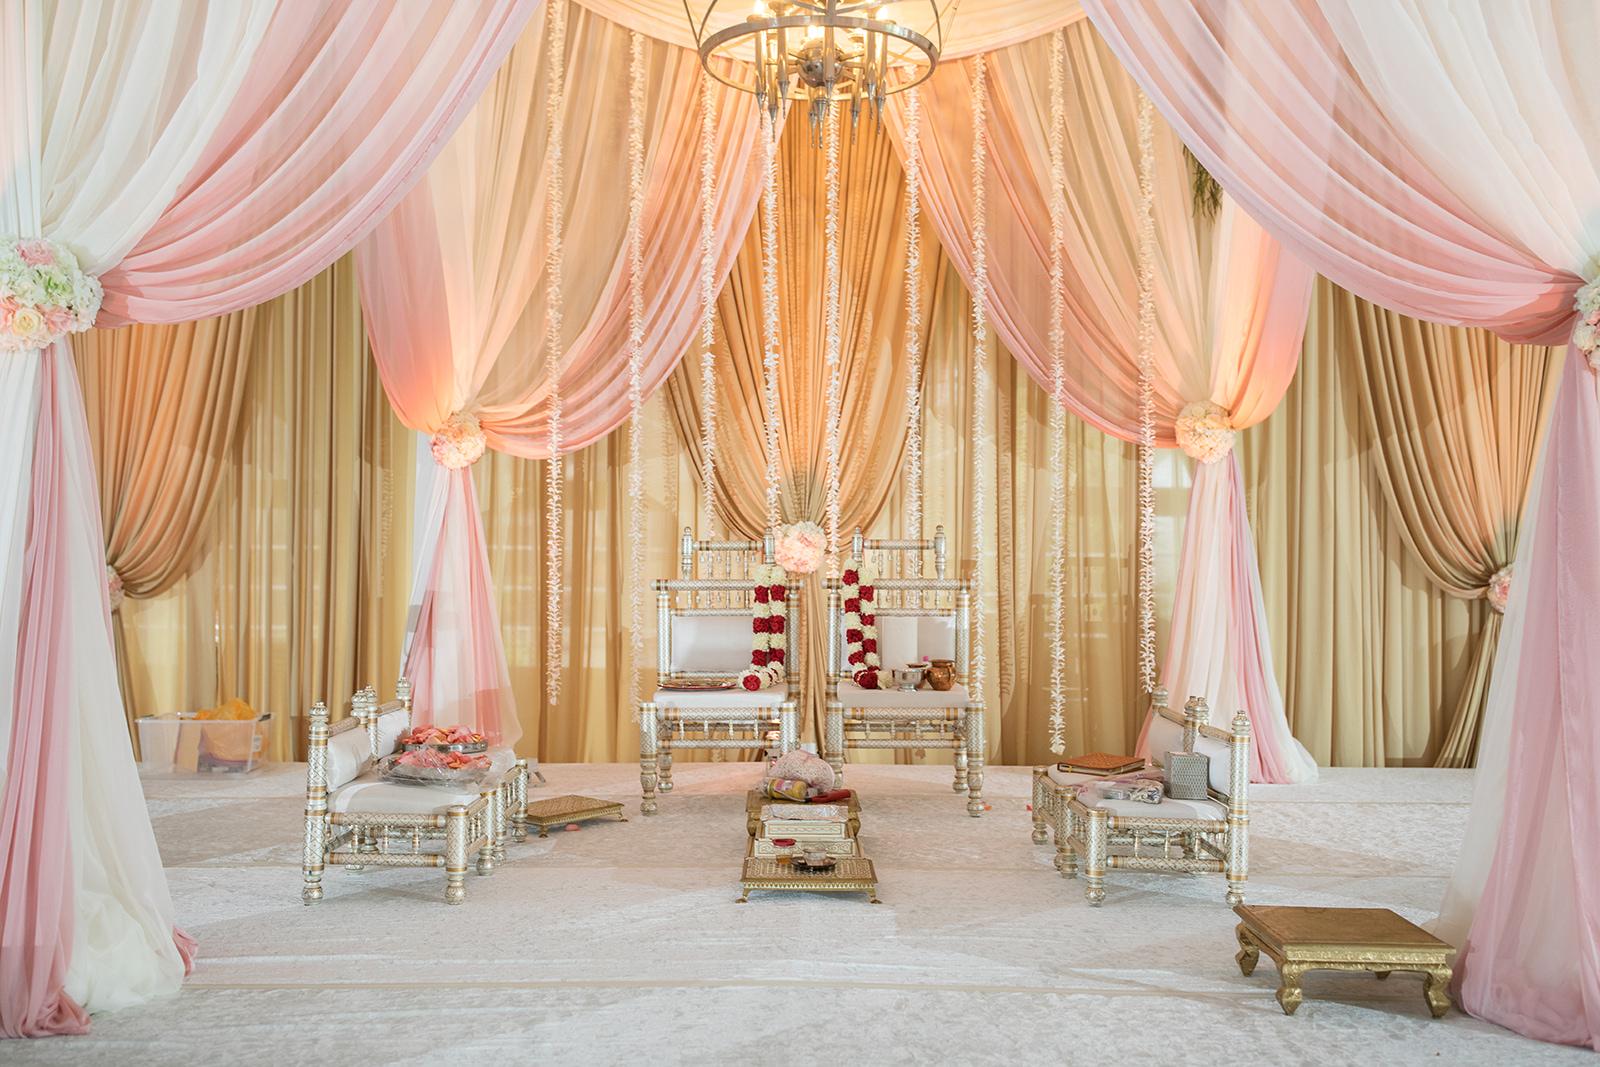 Le Cape Weddings - Sumeet and Chavi - Detalis Ceremony --3.jpg